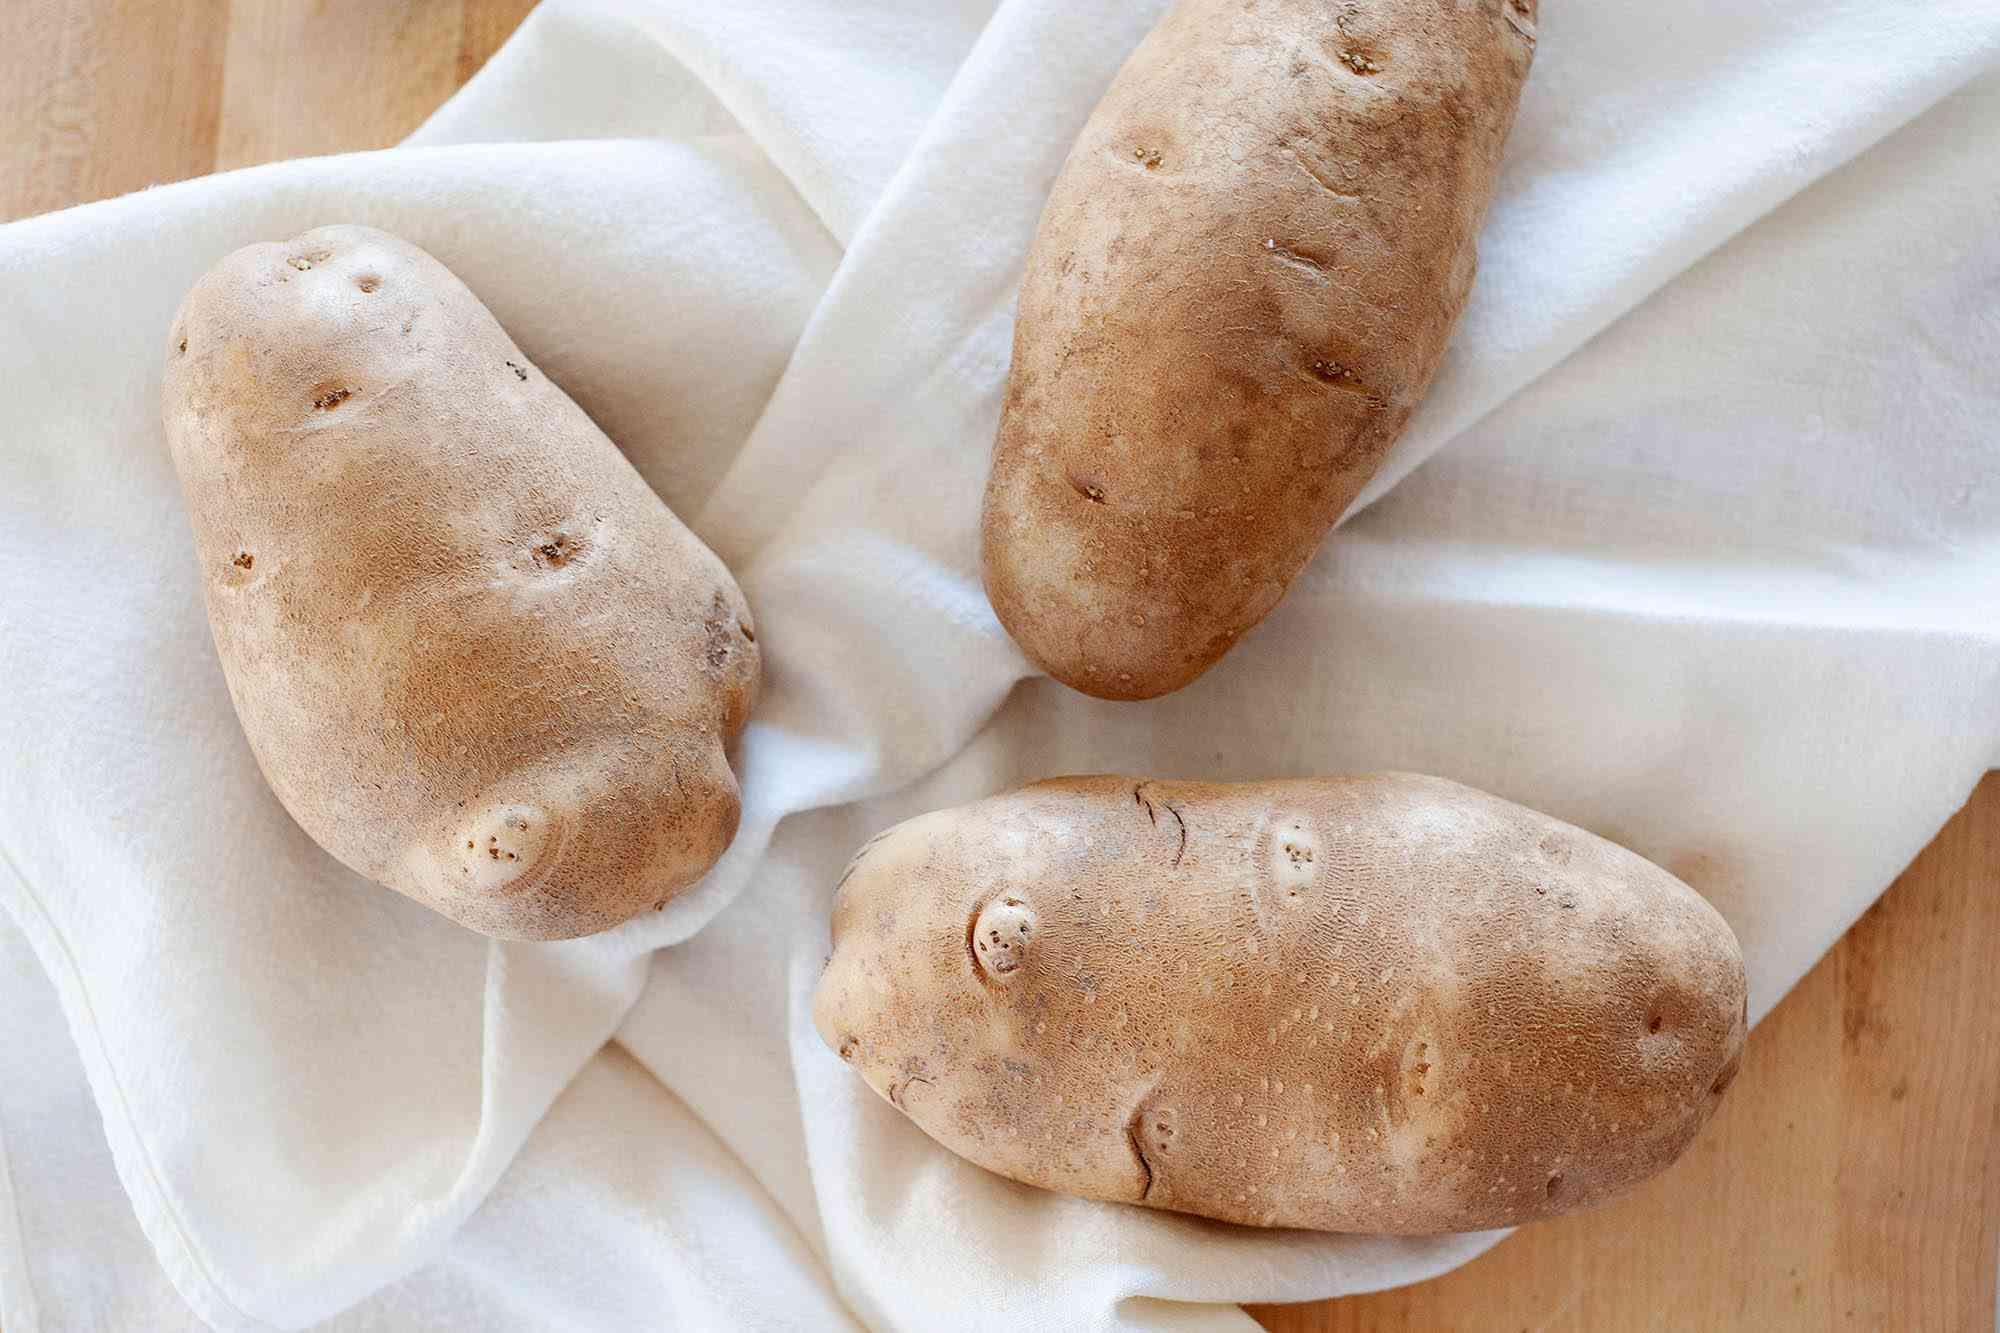 Three russett potatoes on a white linen.